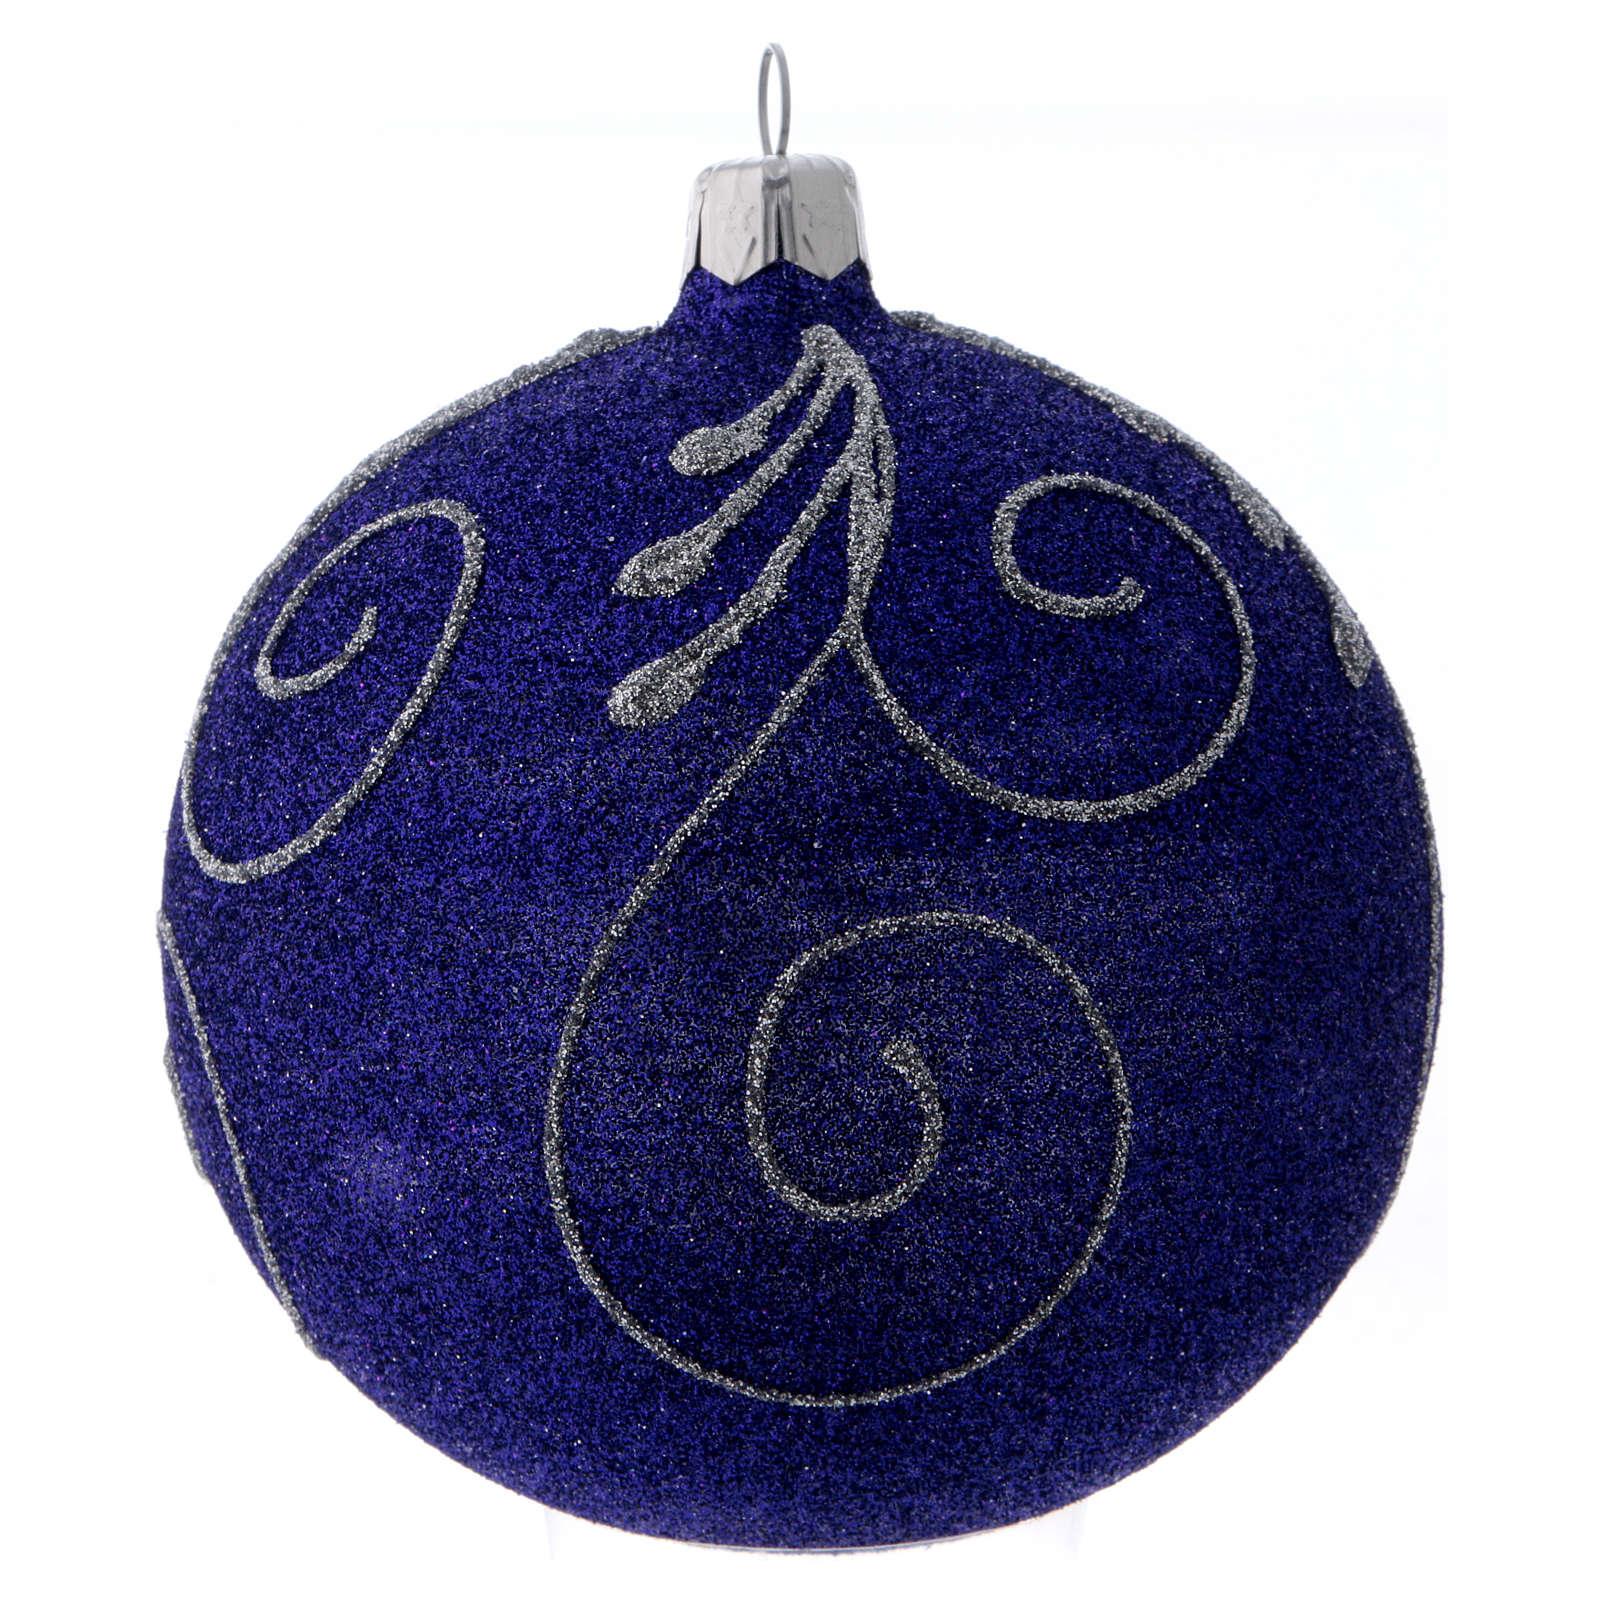 Pallina Natale vetro viola glitterato e argento 100 mm 4